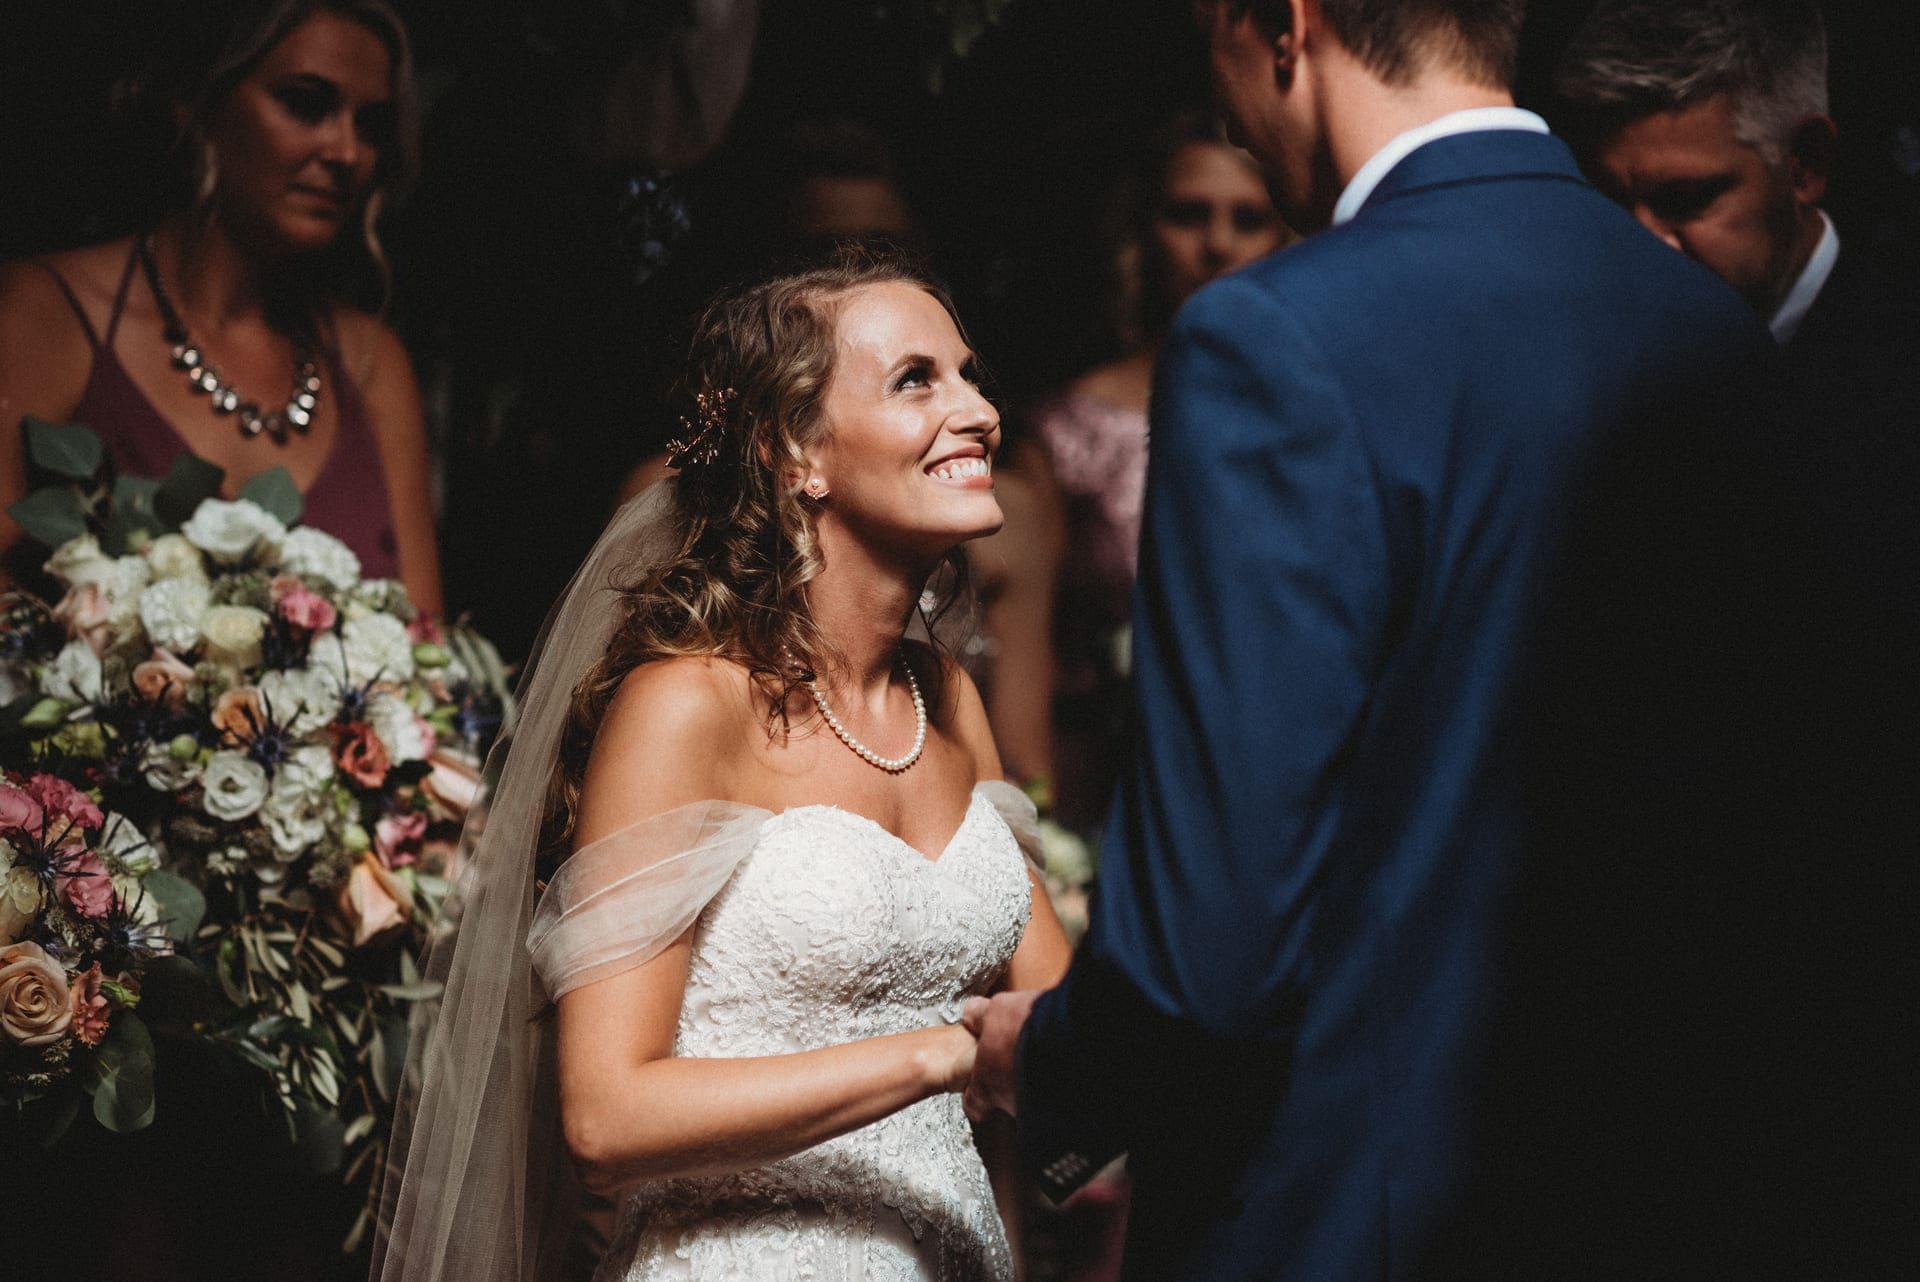 Bride Smile Richland Michigan Wedding Photography